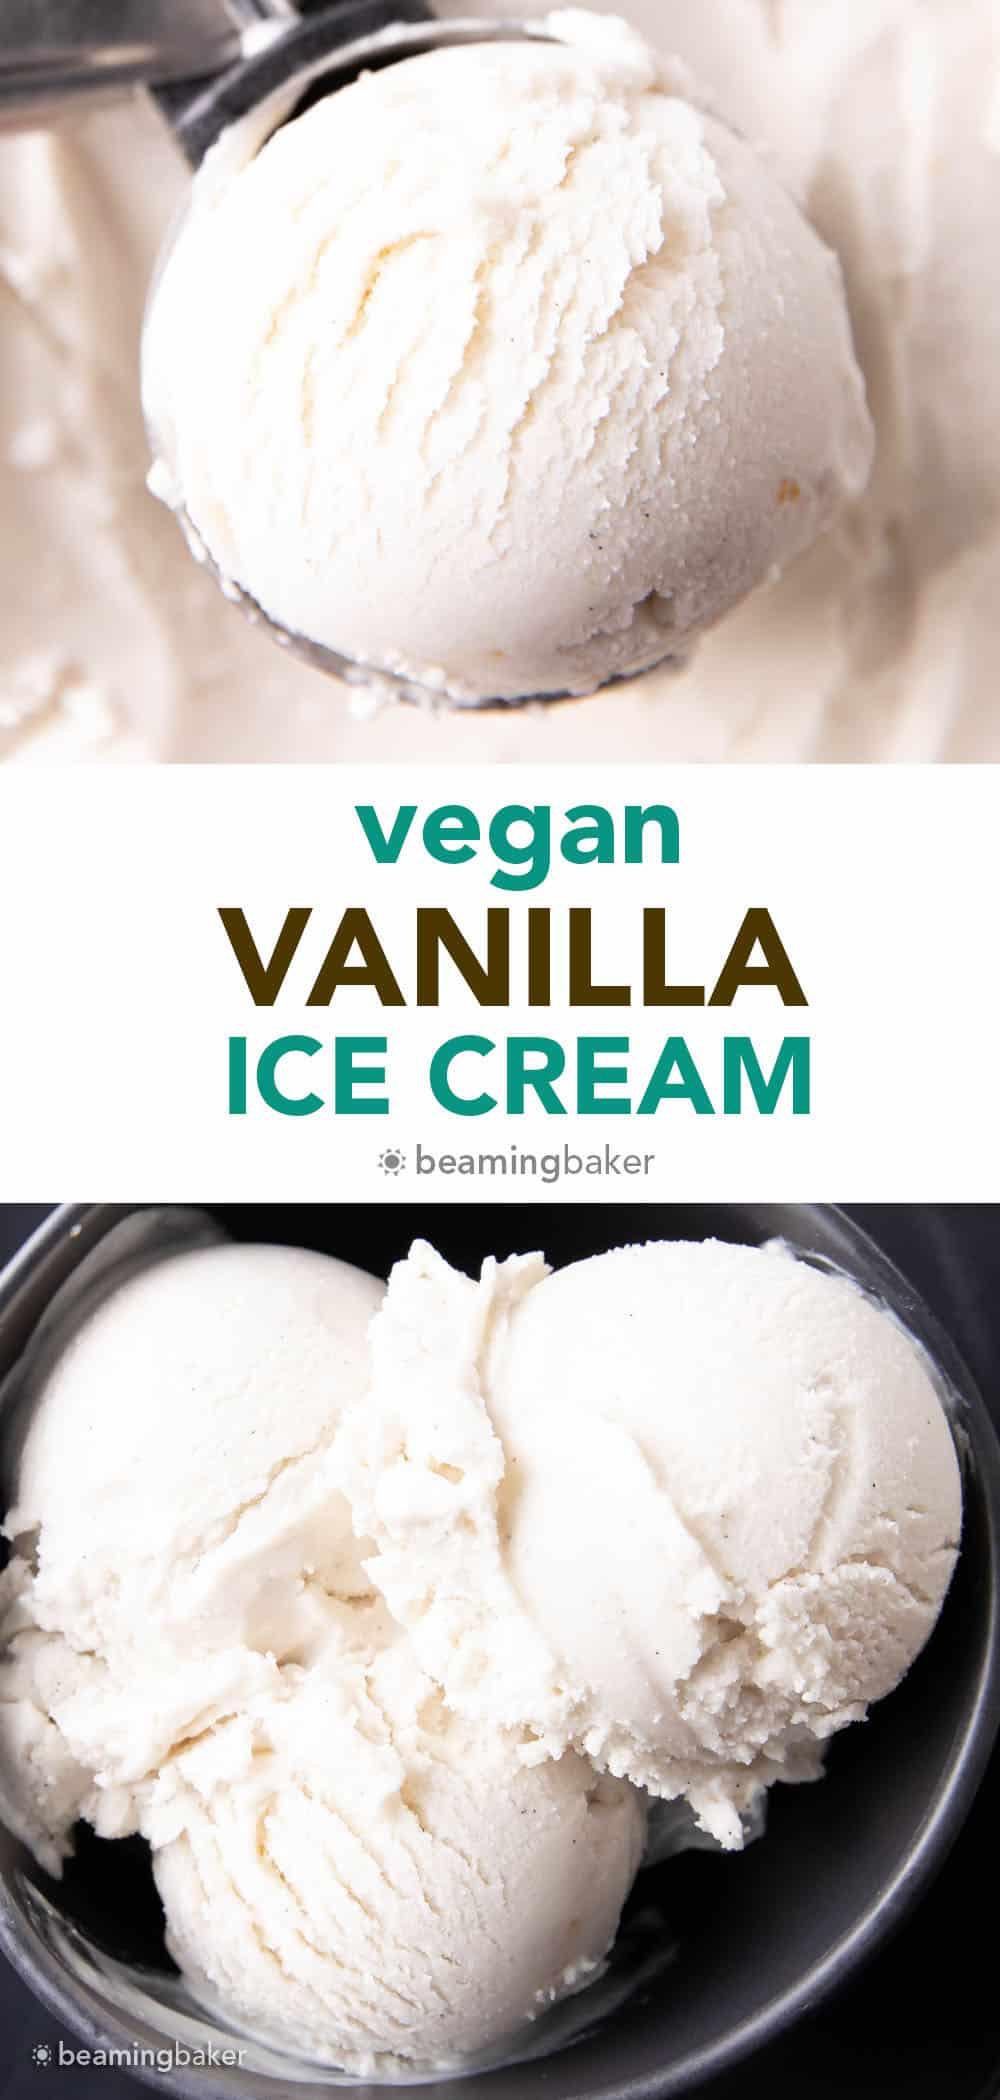 Vegan Vanilla Ice Cream Recipe: this homemade vegan ice cream recipe is easy, rich 'n creamy. The best vegan vanilla ice cream—incredible vanilla flavor, made with simple ingredients. Dairy-Free. #Vegan #IceCream #DairyFree #NonDairy | Recipe at BeamingBaker.com